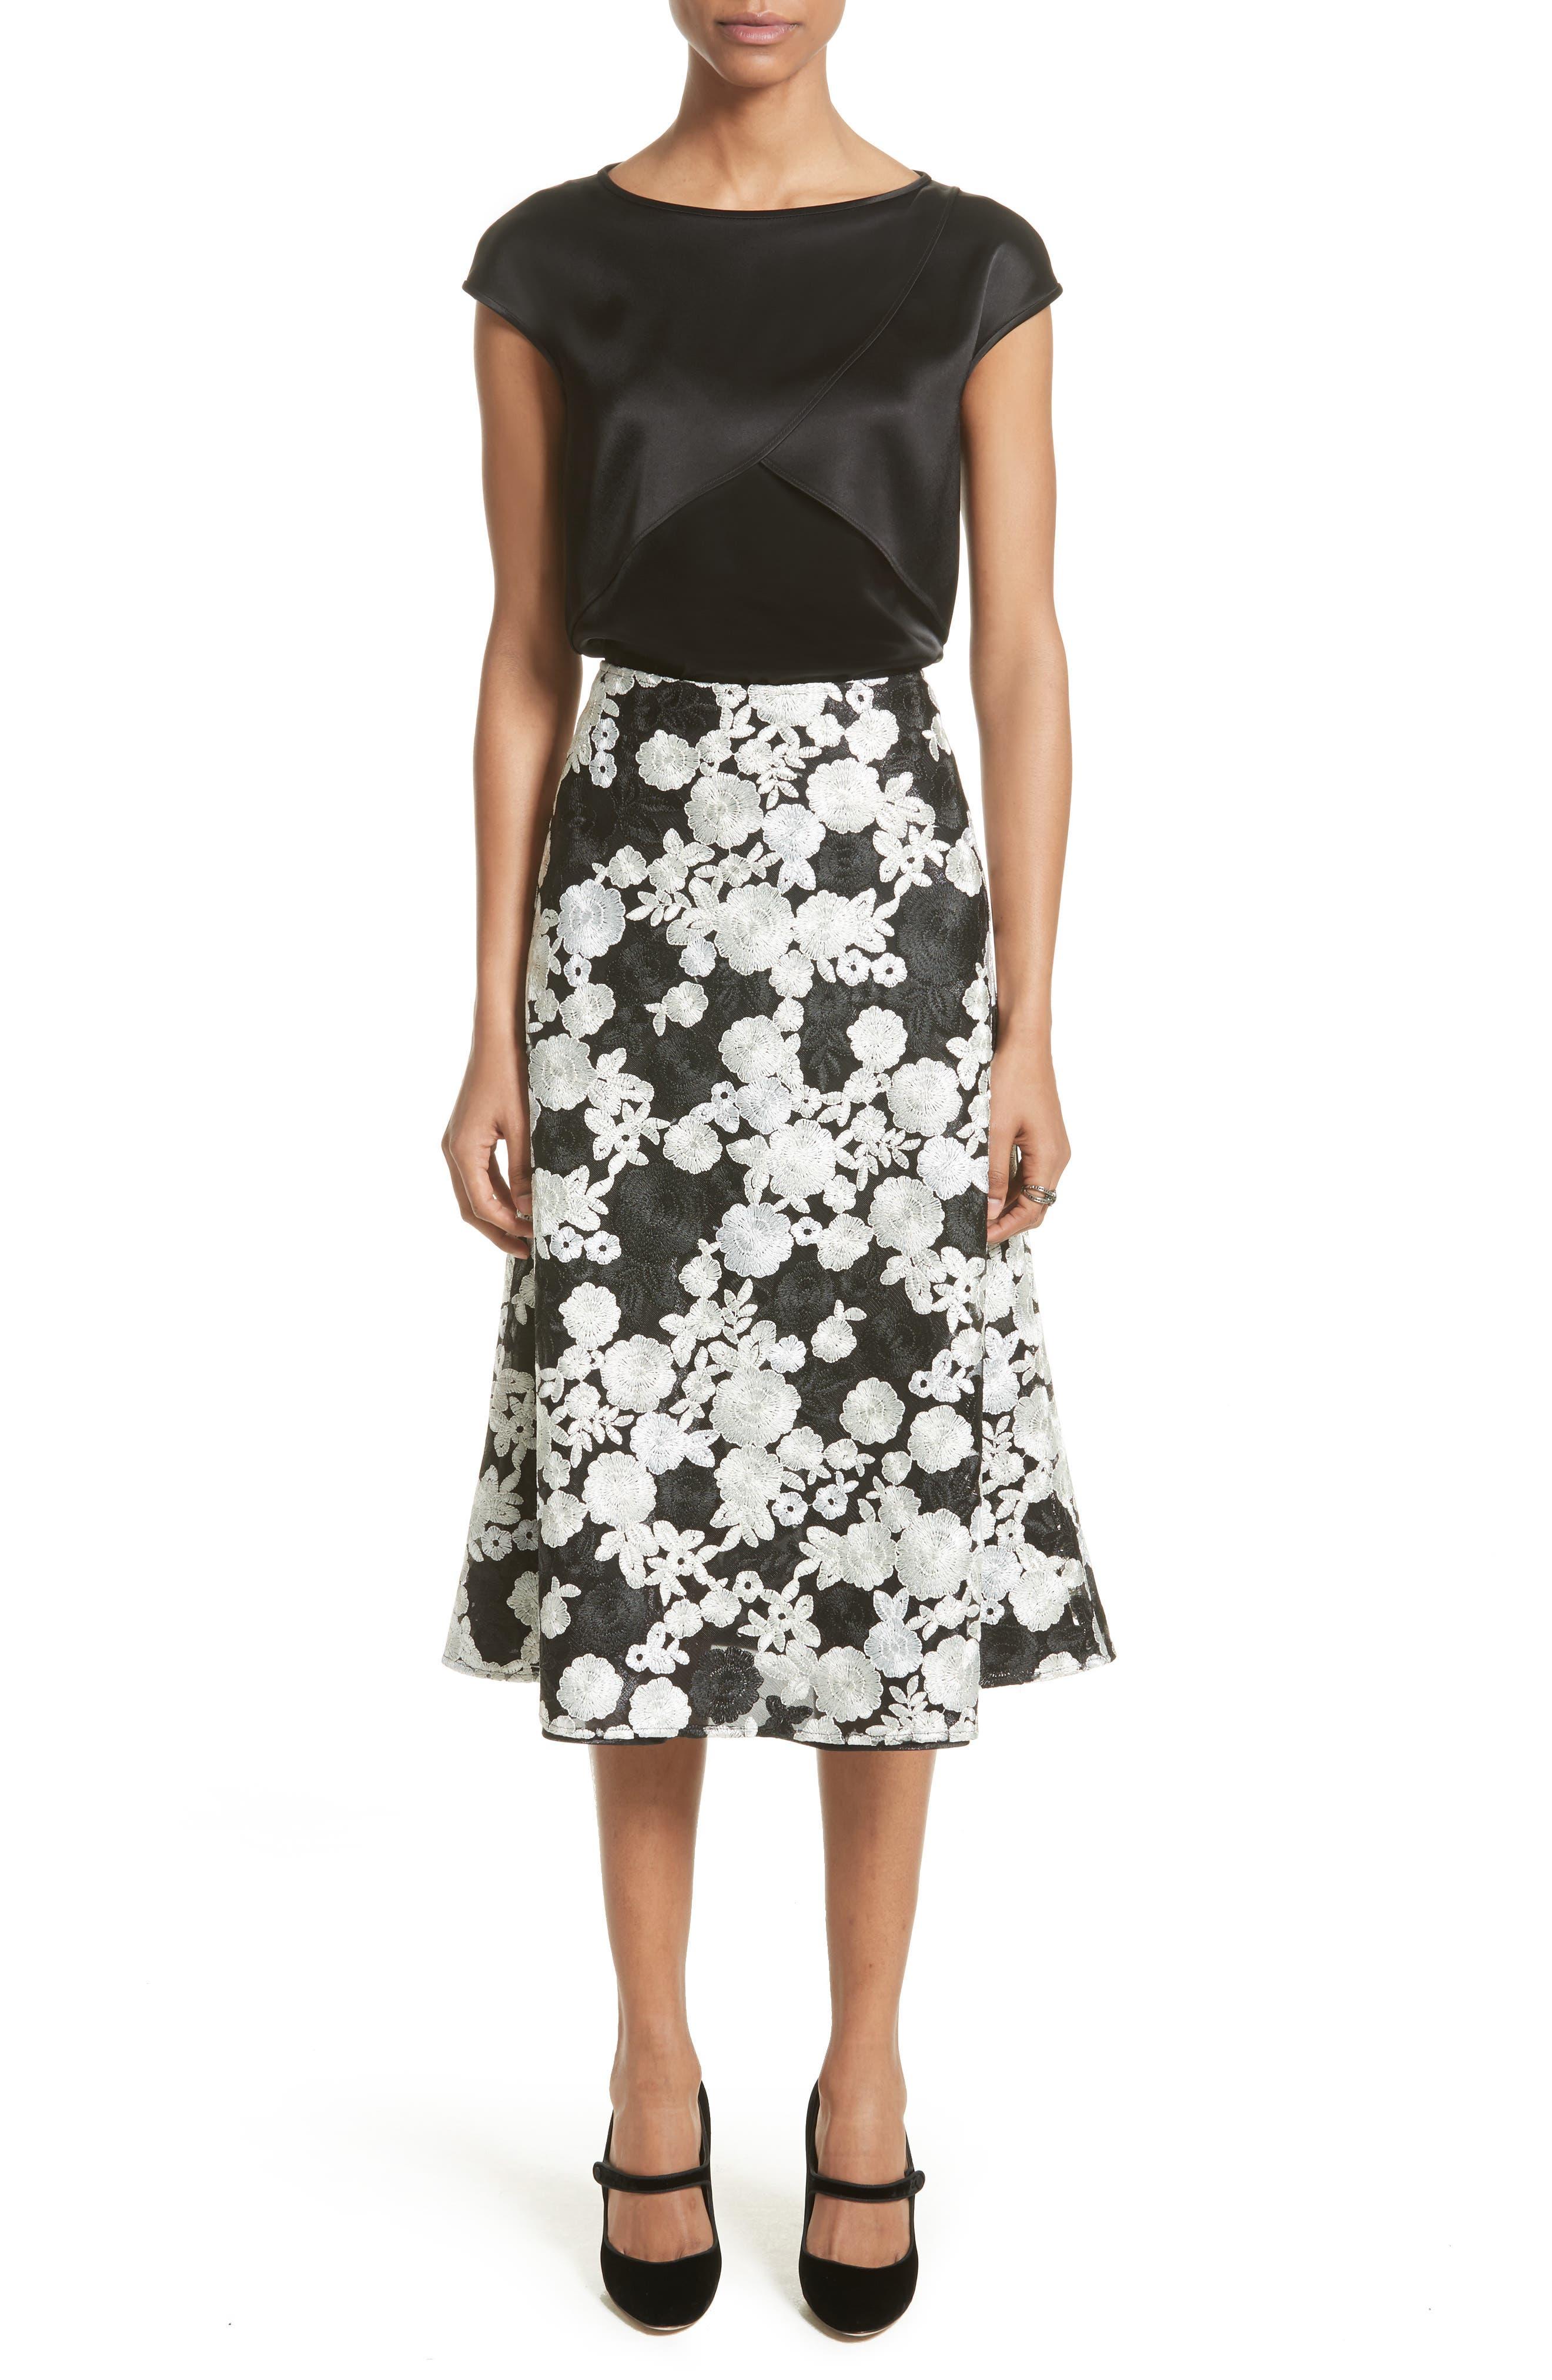 St. John Floral Embroidered Flared Skirt,                             Alternate thumbnail 8, color,                             Caviar Multi